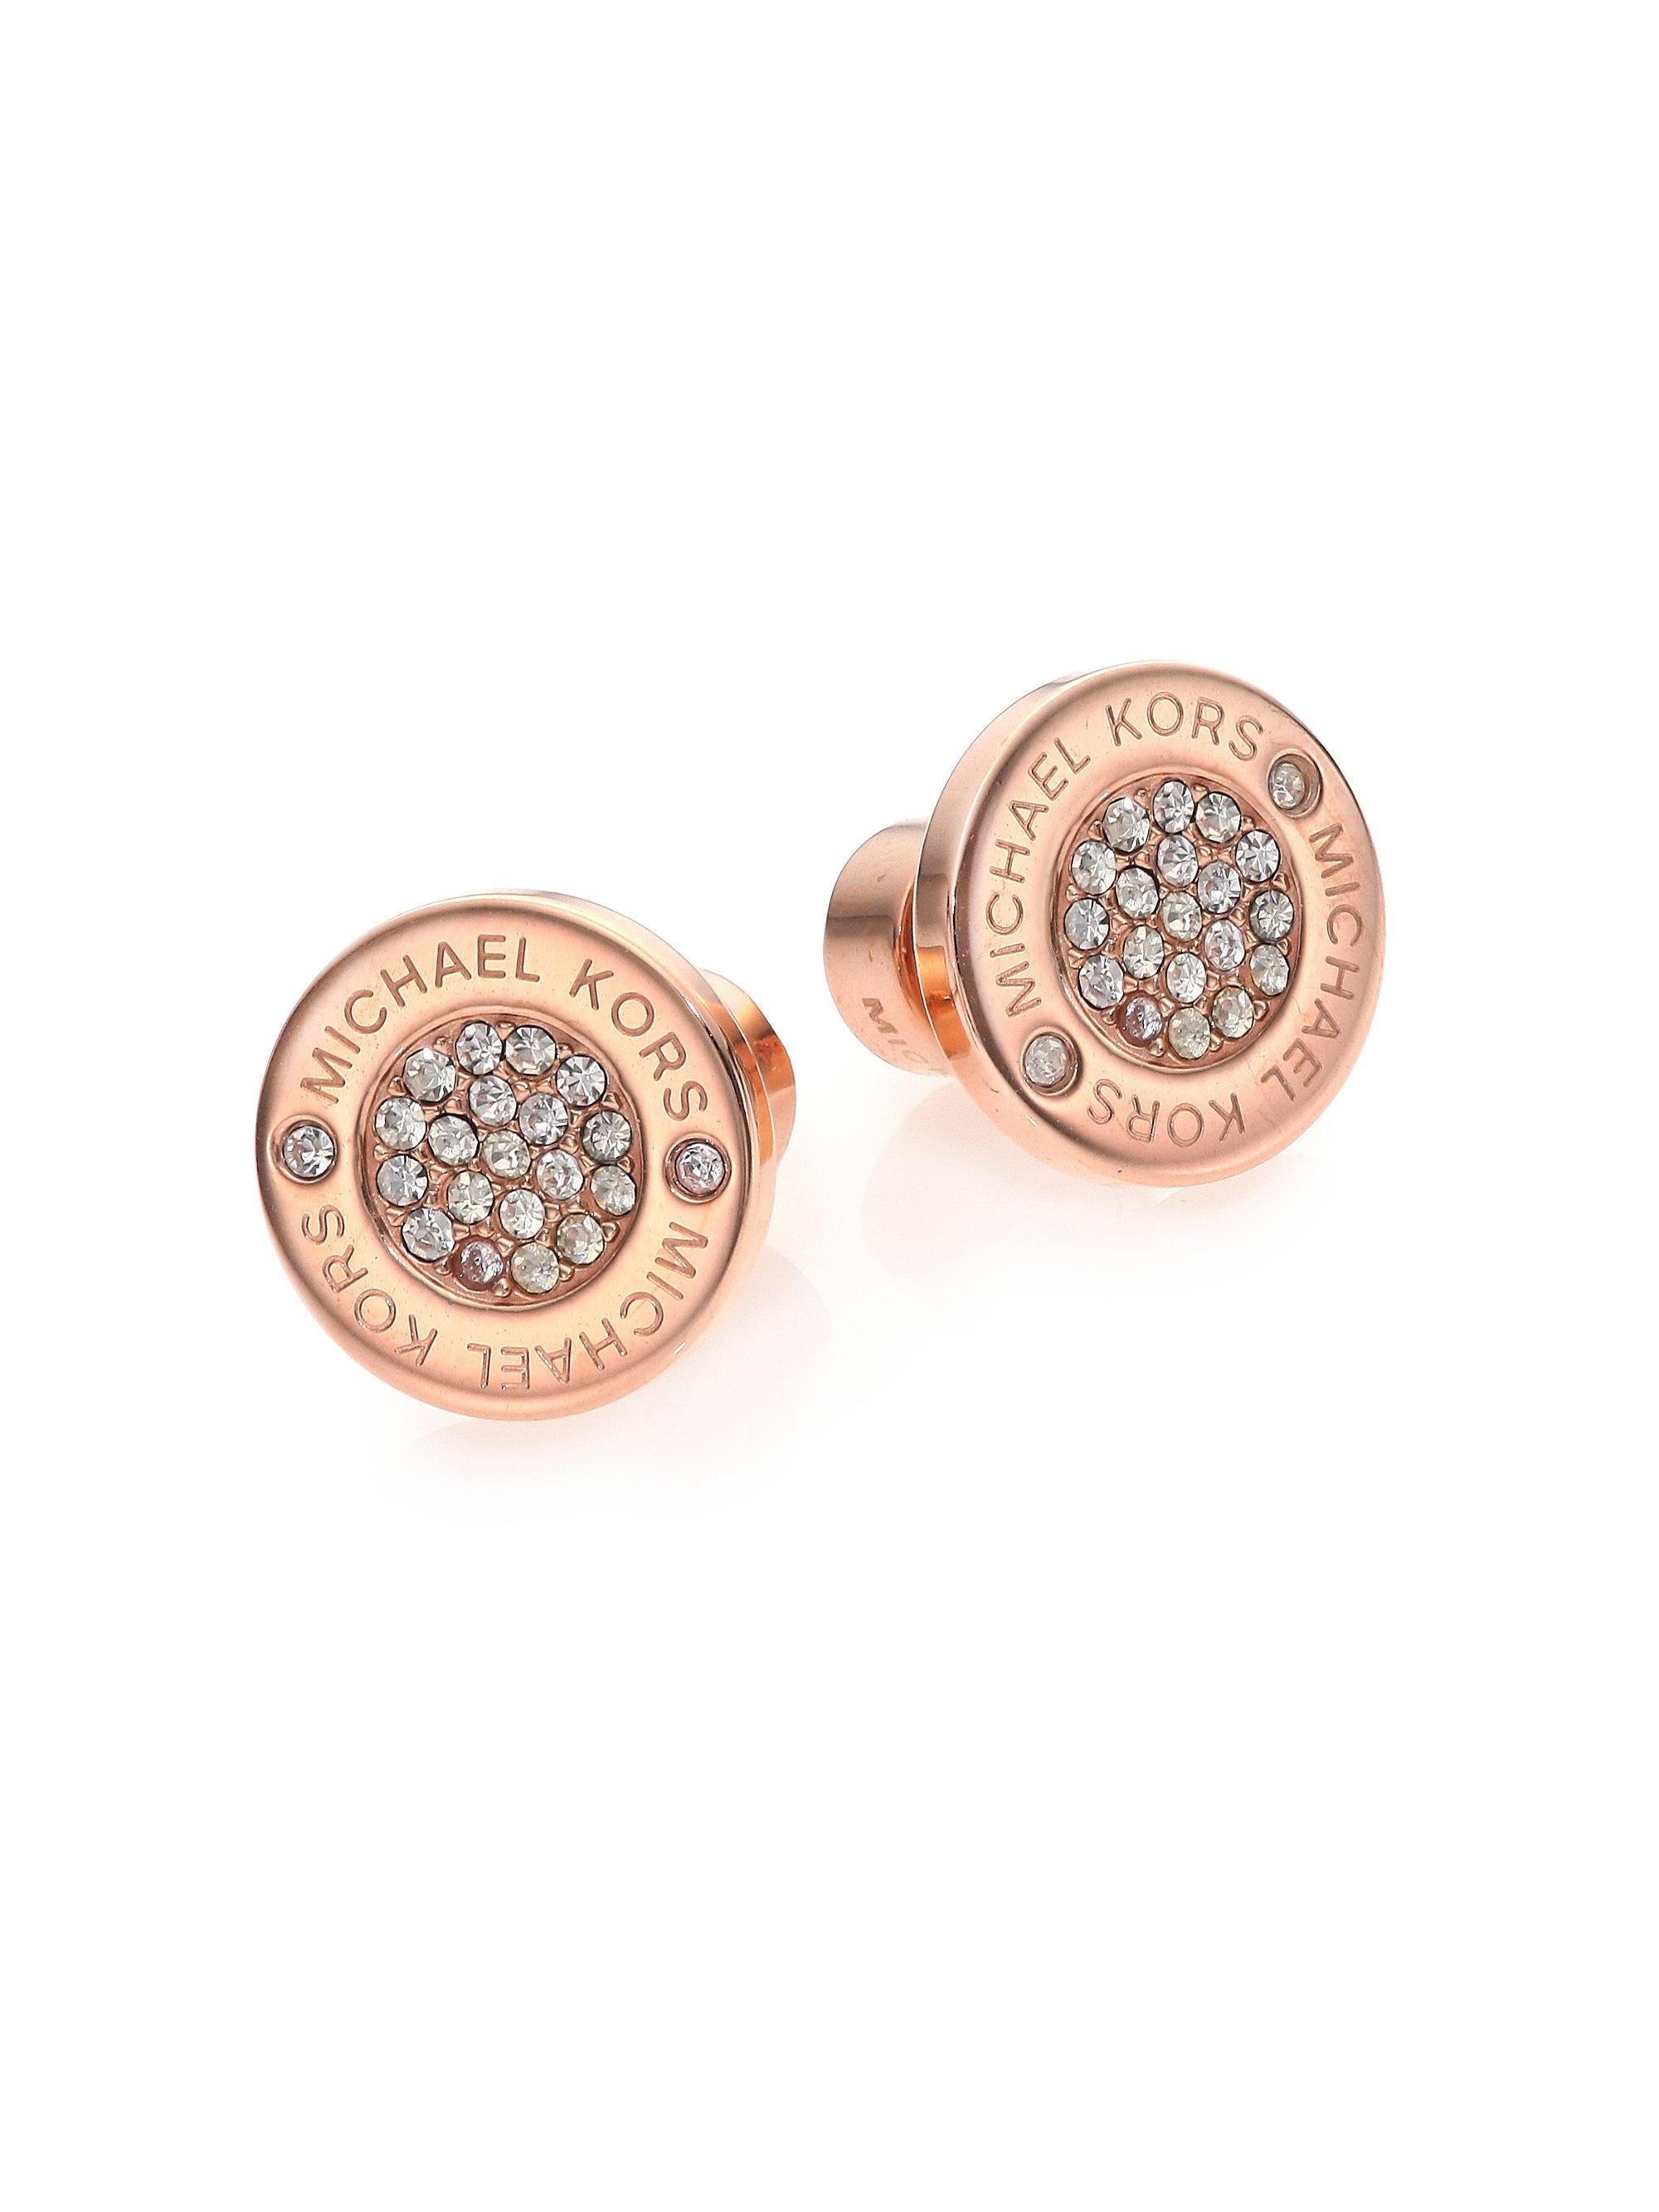 8a5bafab8876 Michael Kors Heritage Plaque Pavé Logo Stud Earrings rose Goldtone ...